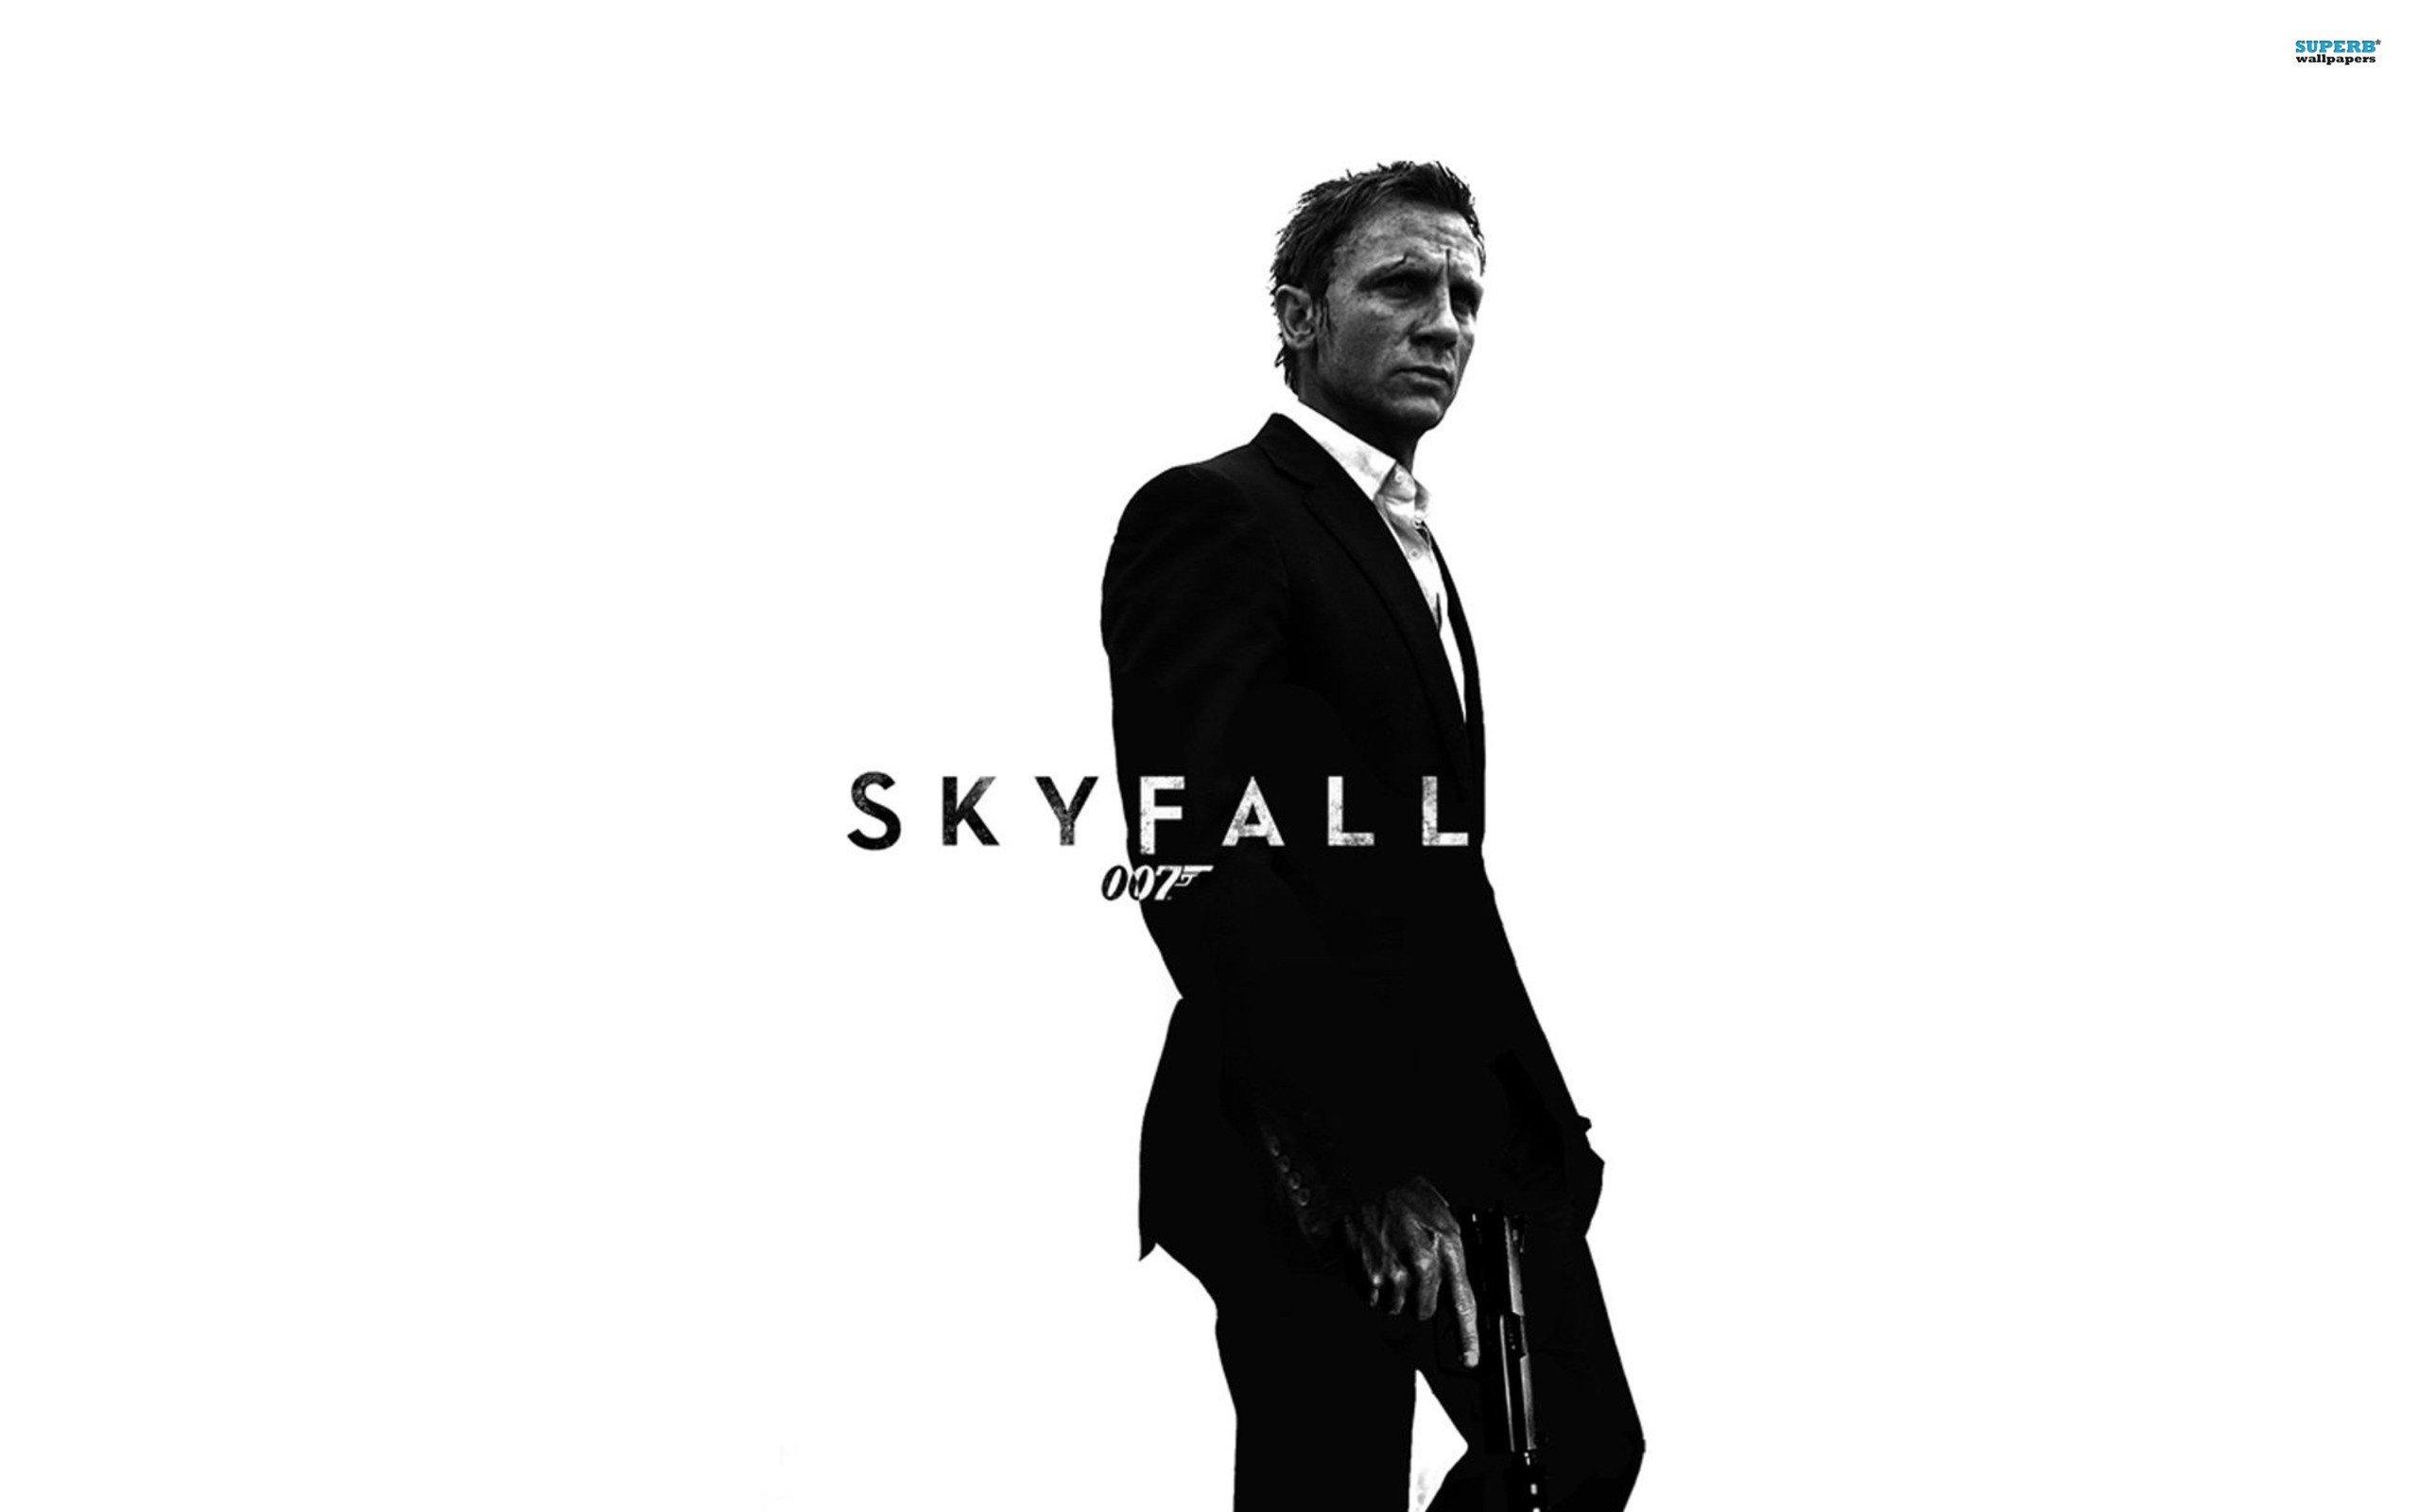 James Bond Wallpapers  Full HD wallpaper search